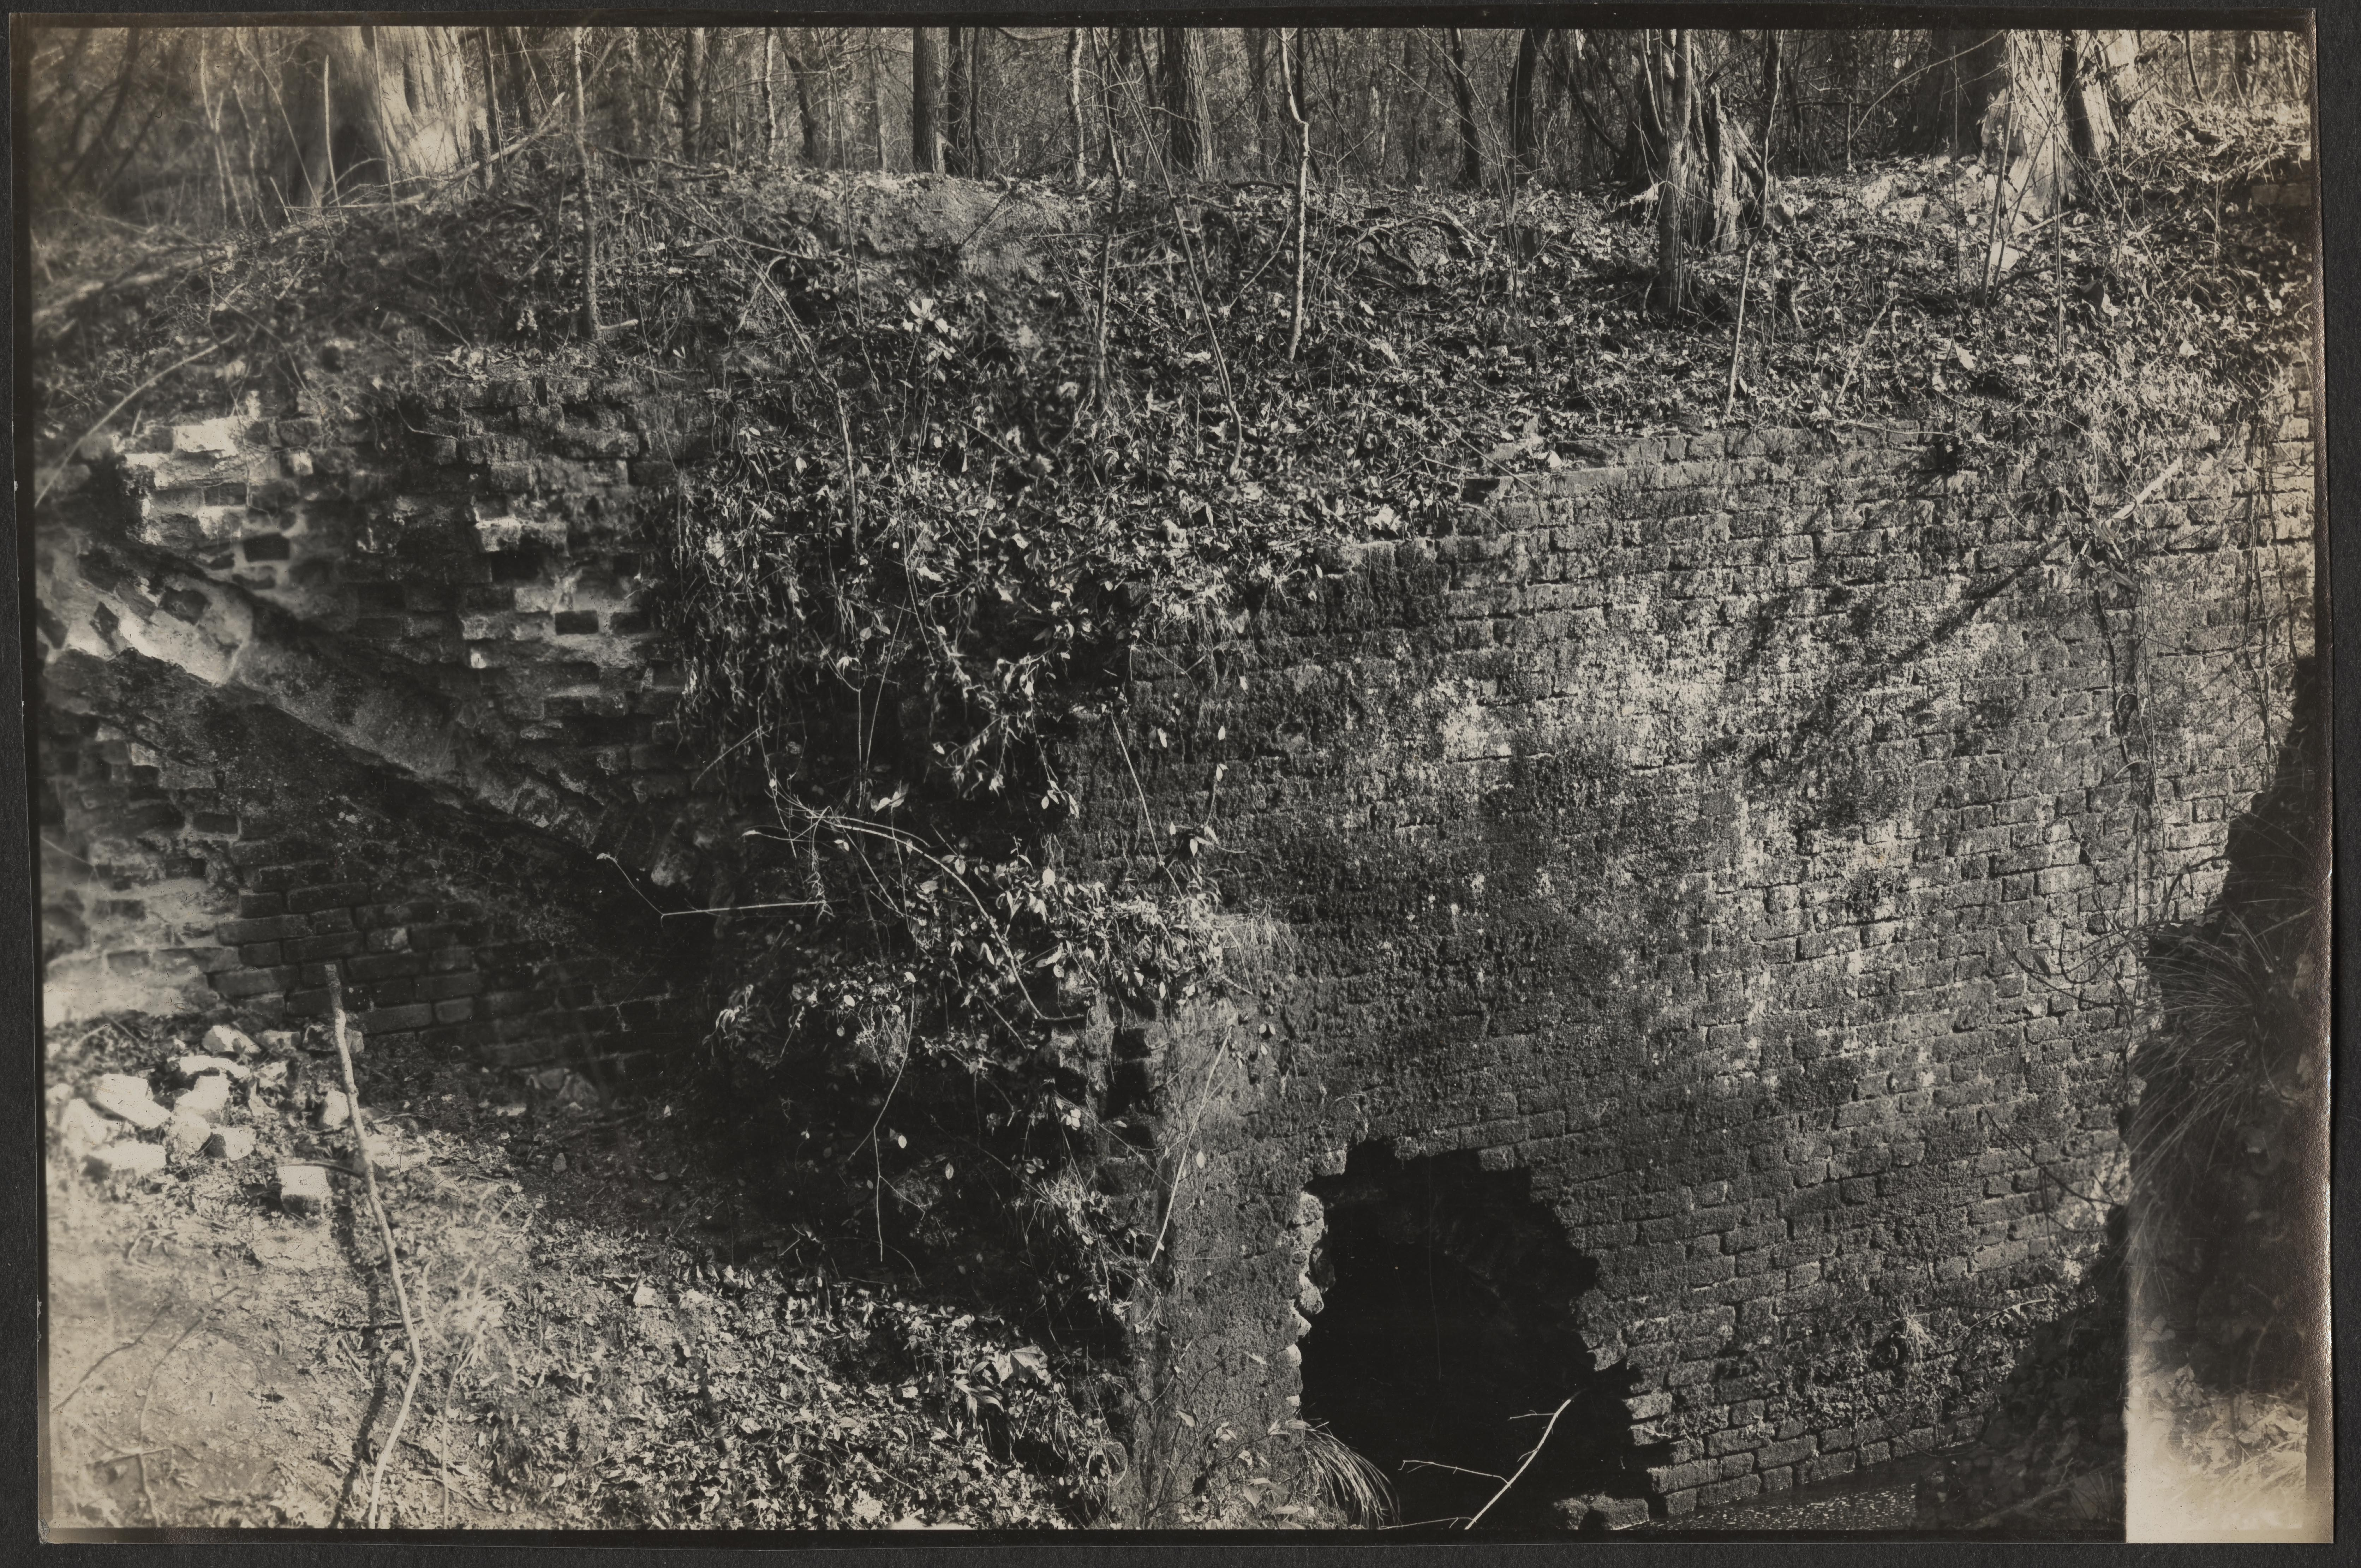 Santee-Cooper Cemetery Investigation 025